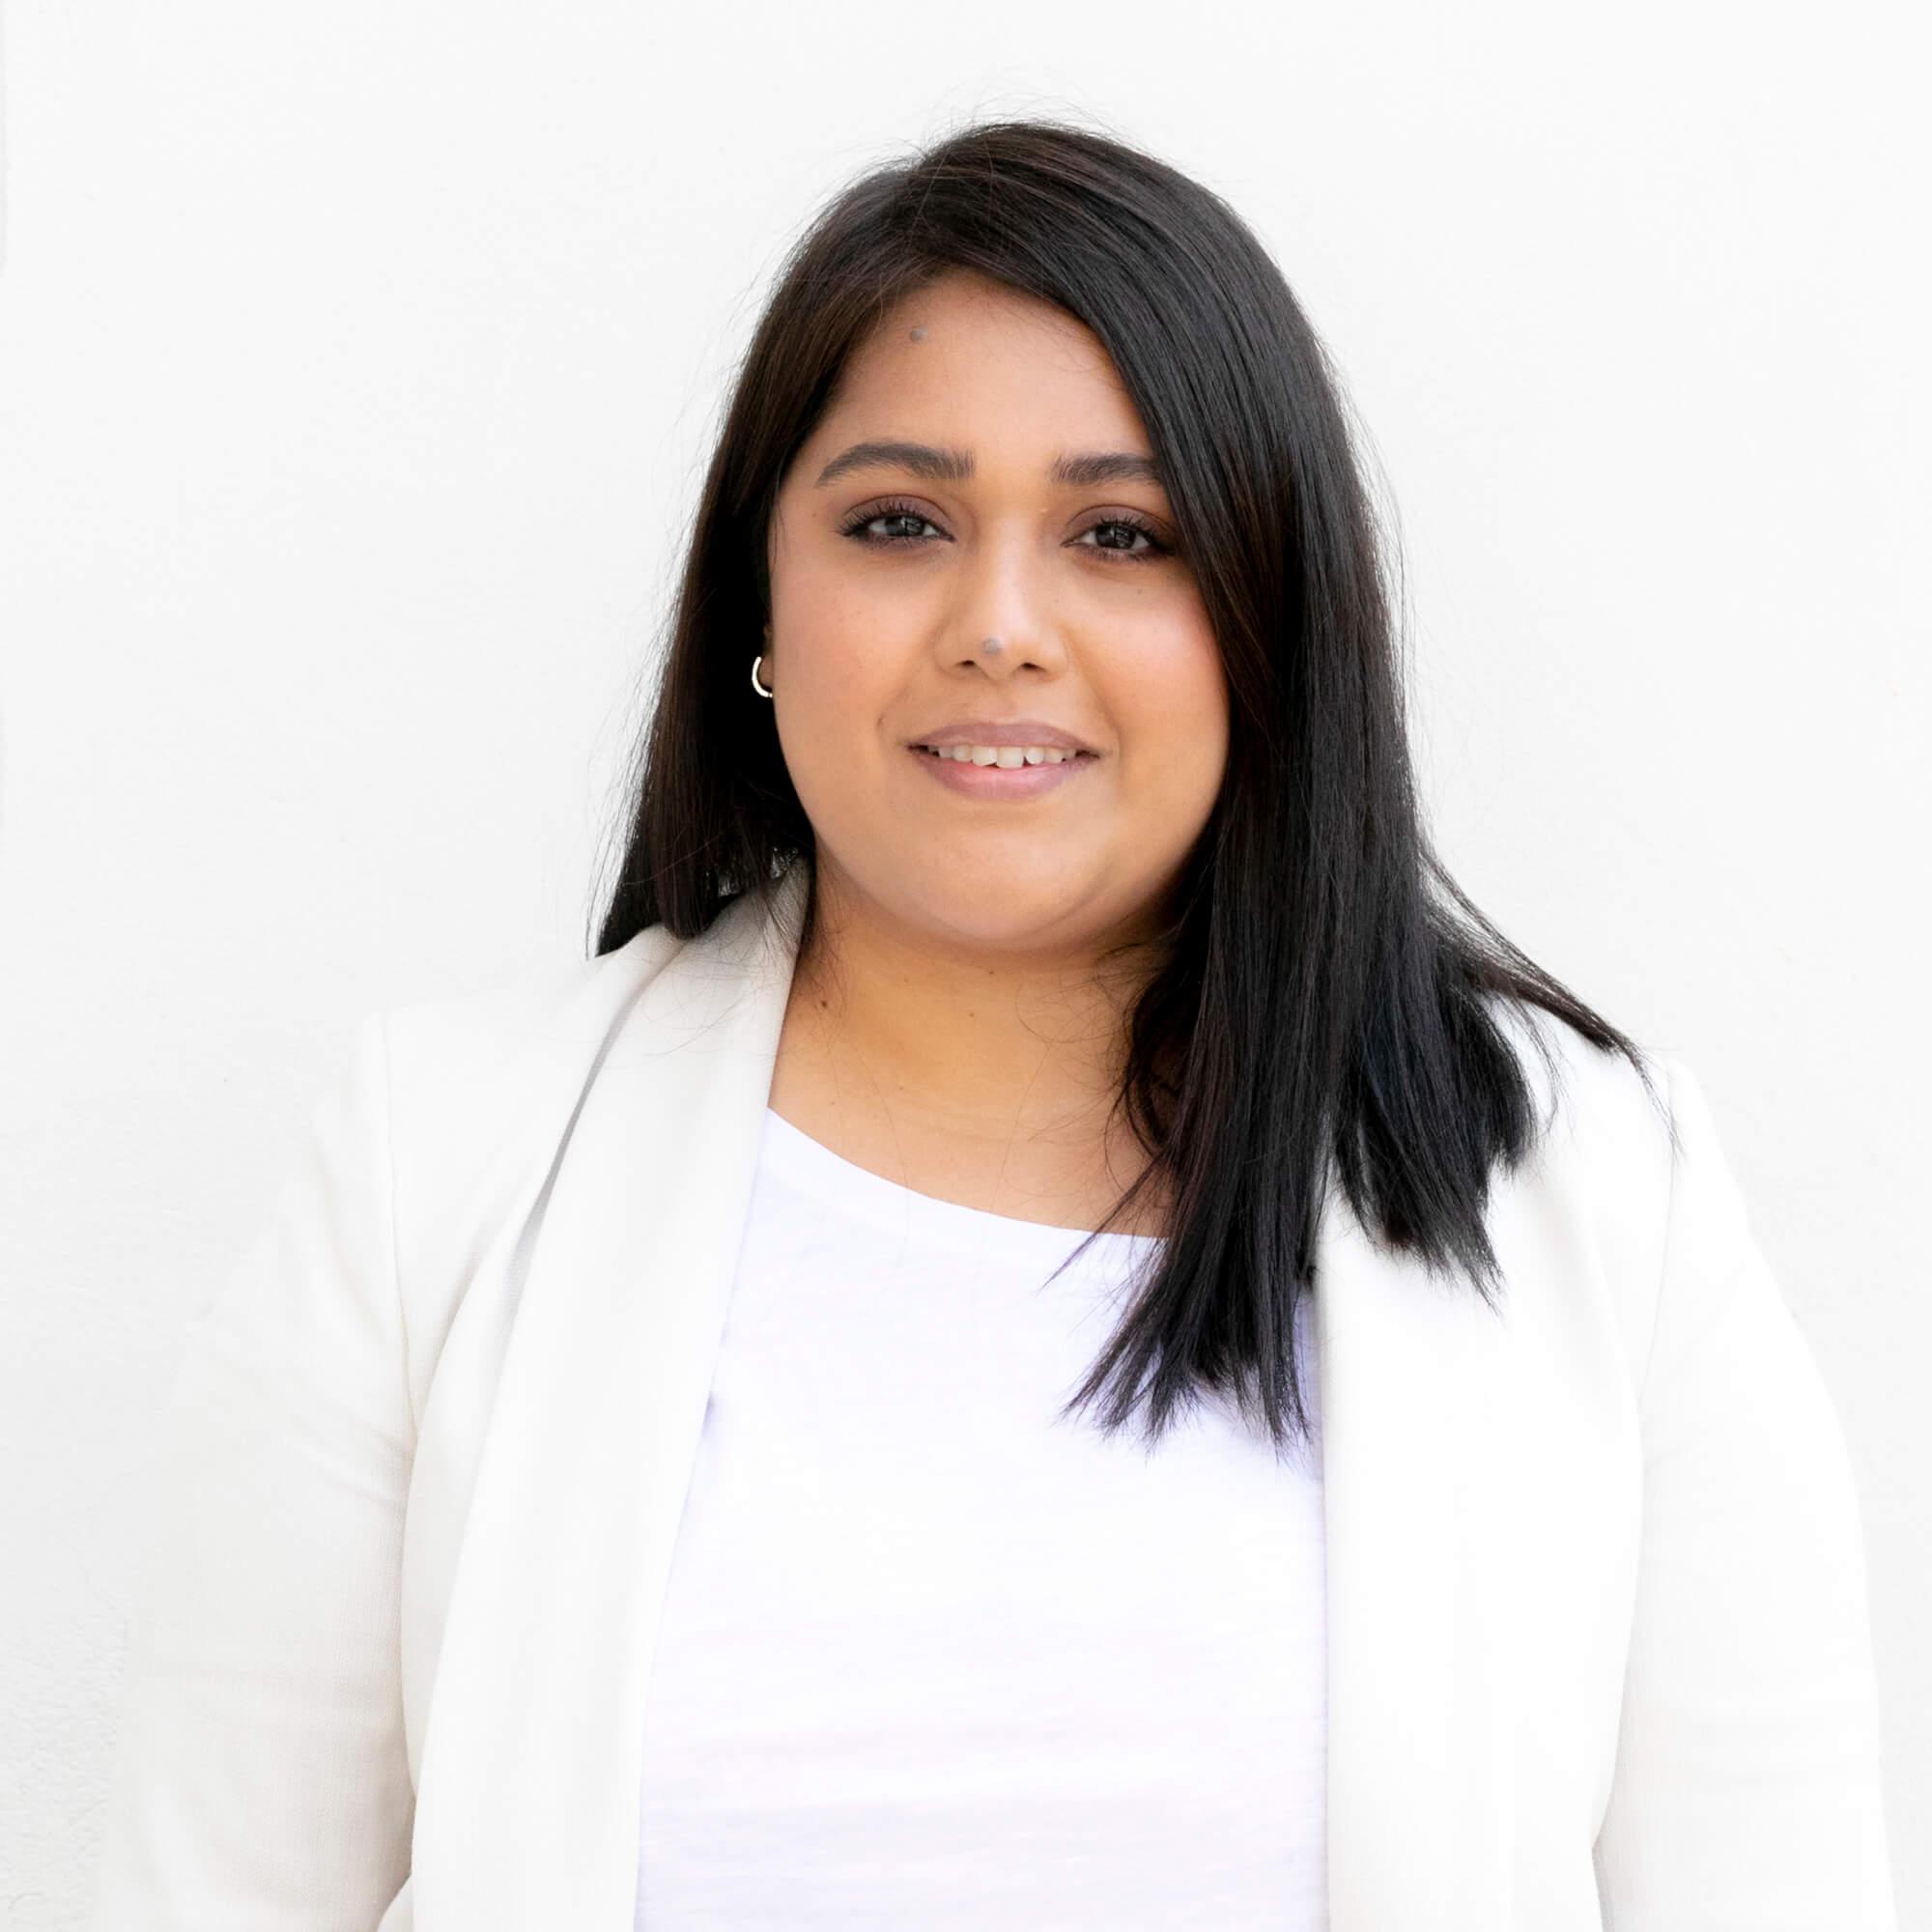 Maryum Syeda